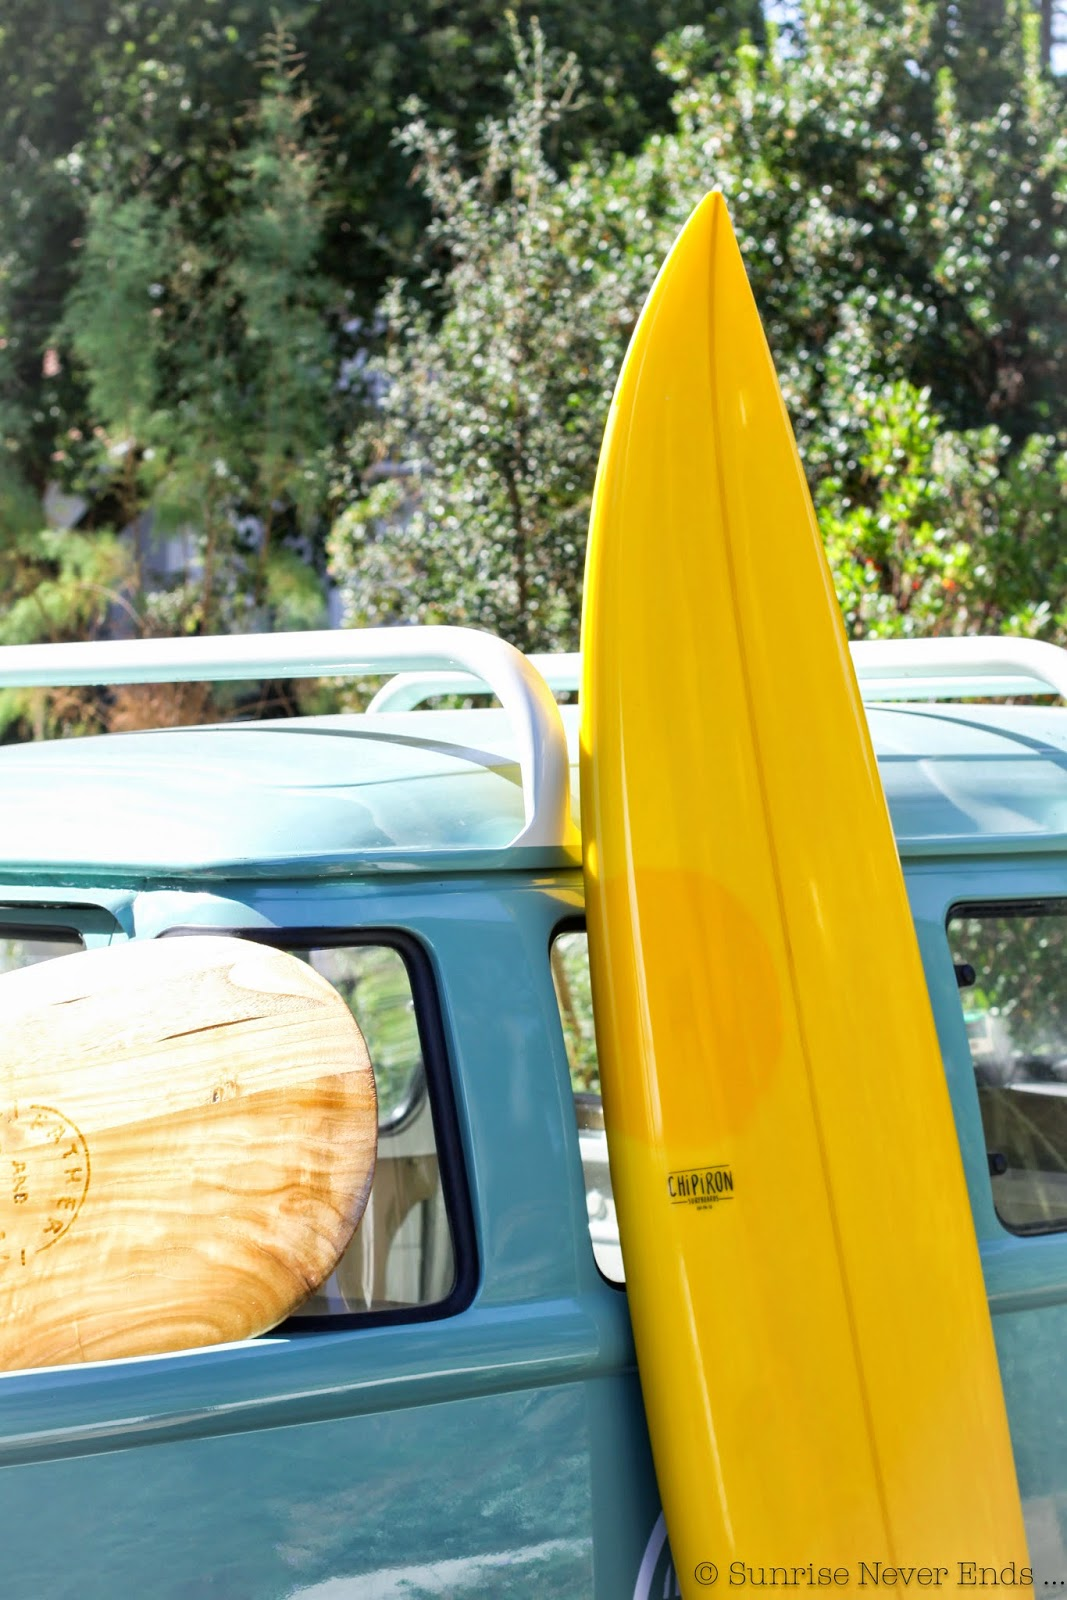 lake loft hossegor,chipiron surfboards, father and son, alaia,surf,surfboards,hossegor,combi ww